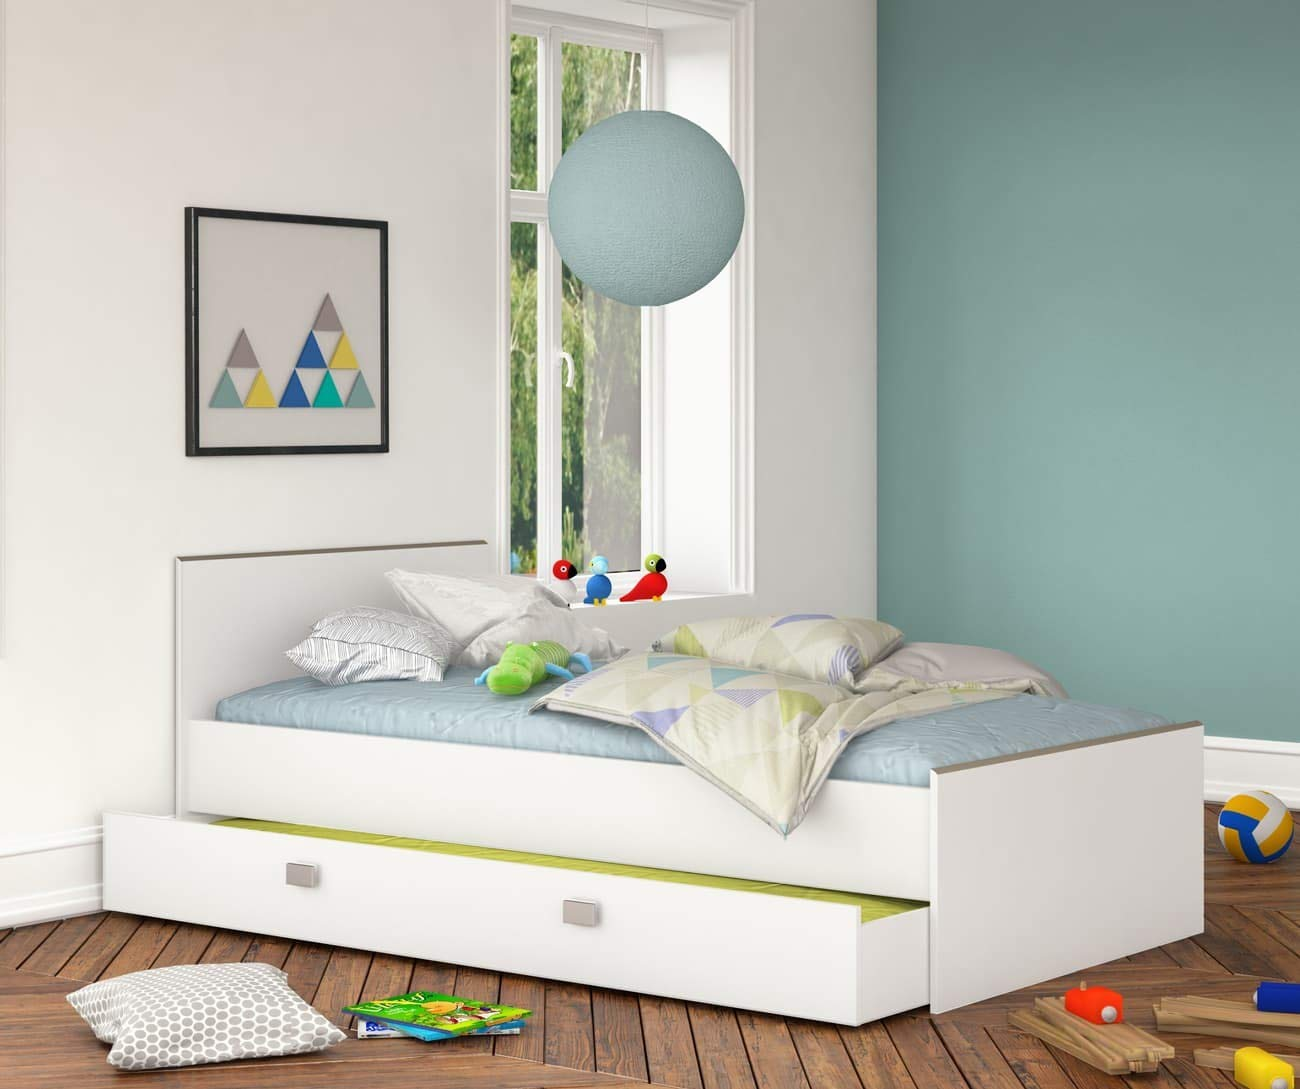 Bilira/_Kids Jugendbett mit Bettkasten Funktionsbett Bettgestell Kinderbett G/ästebett 90x200 Kinderbett Liege Wei/ß